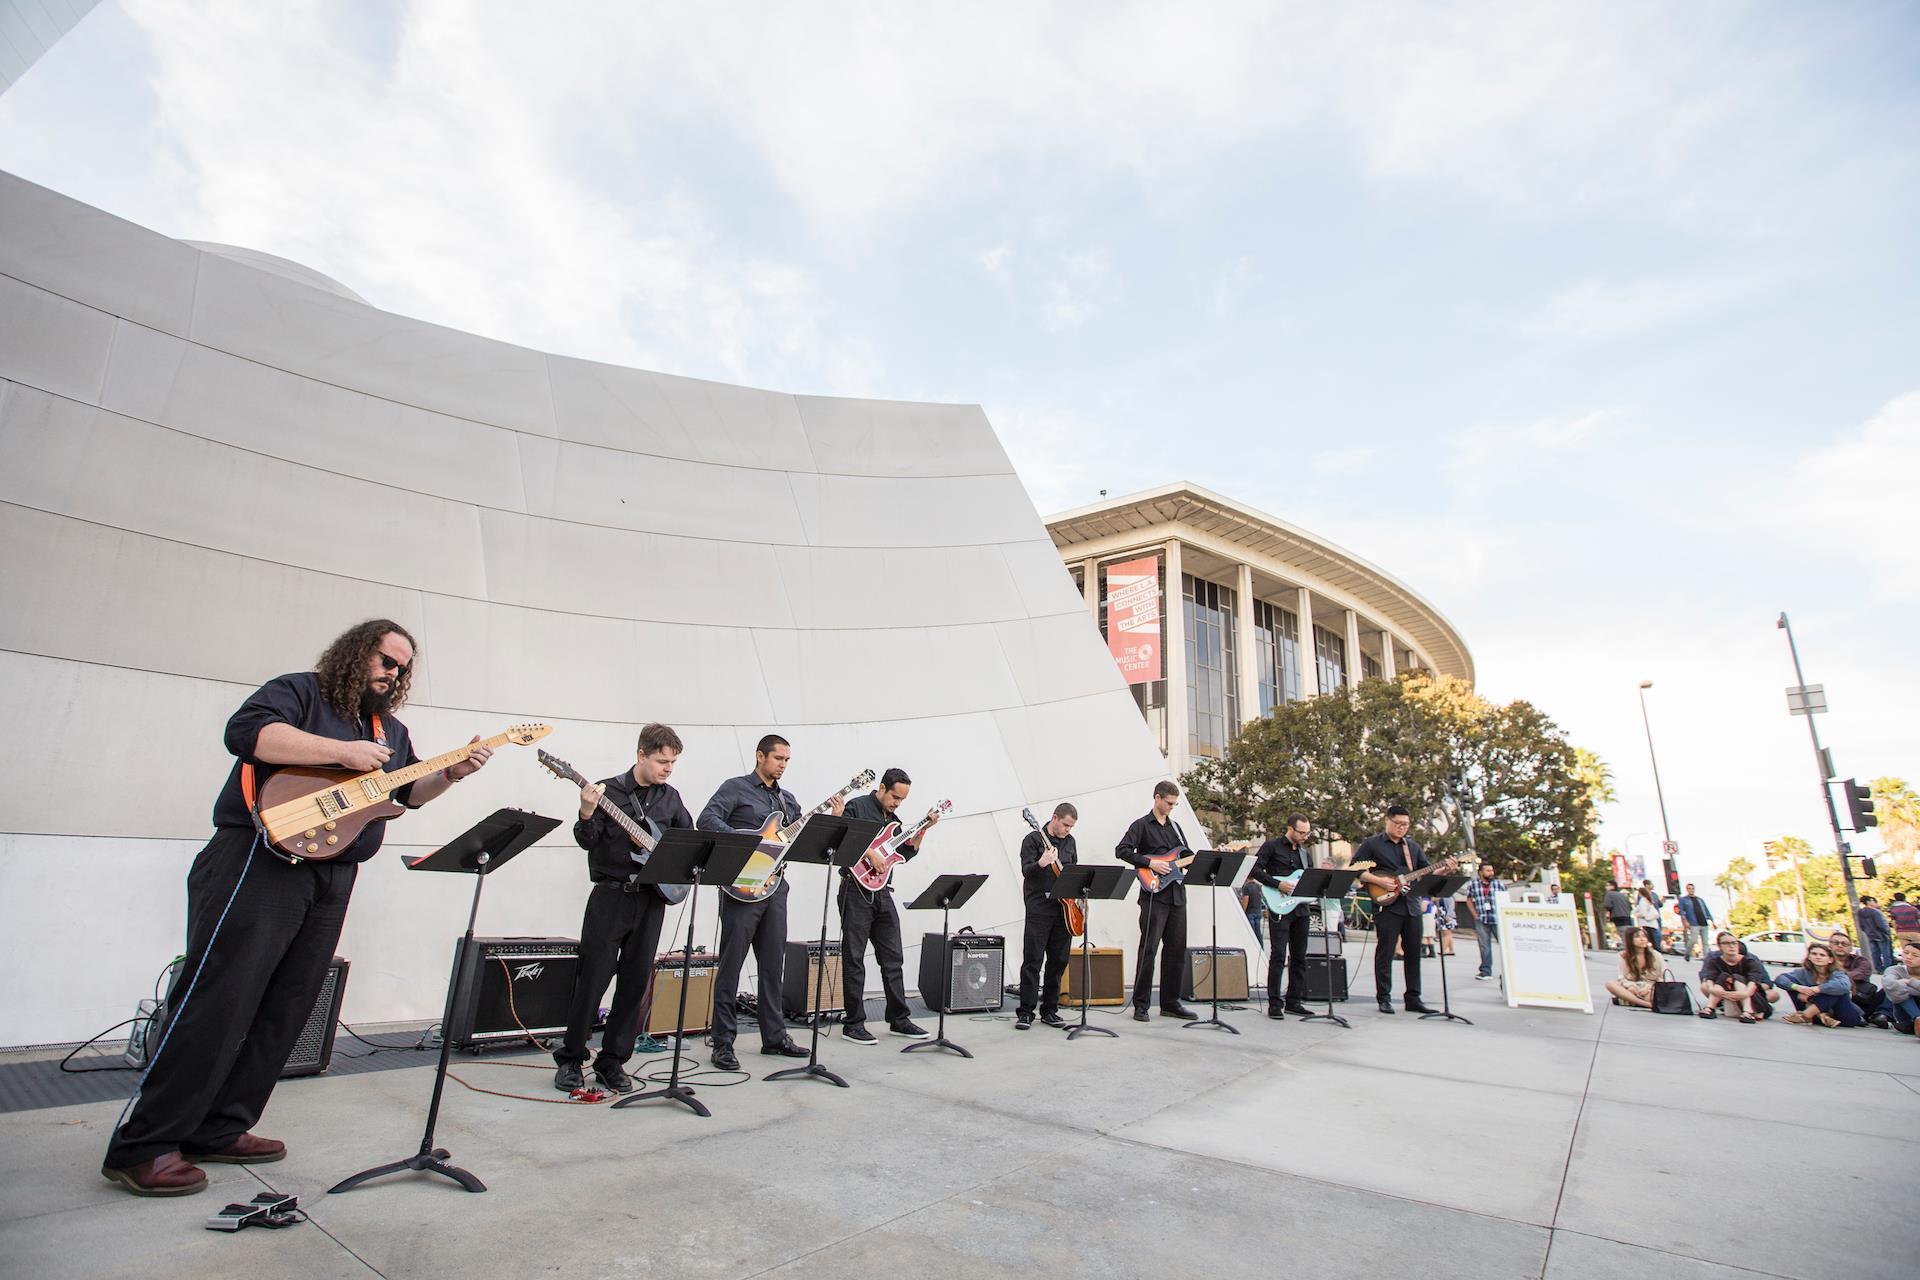 Noon to Midnight @ Walt Disney Concert Hall